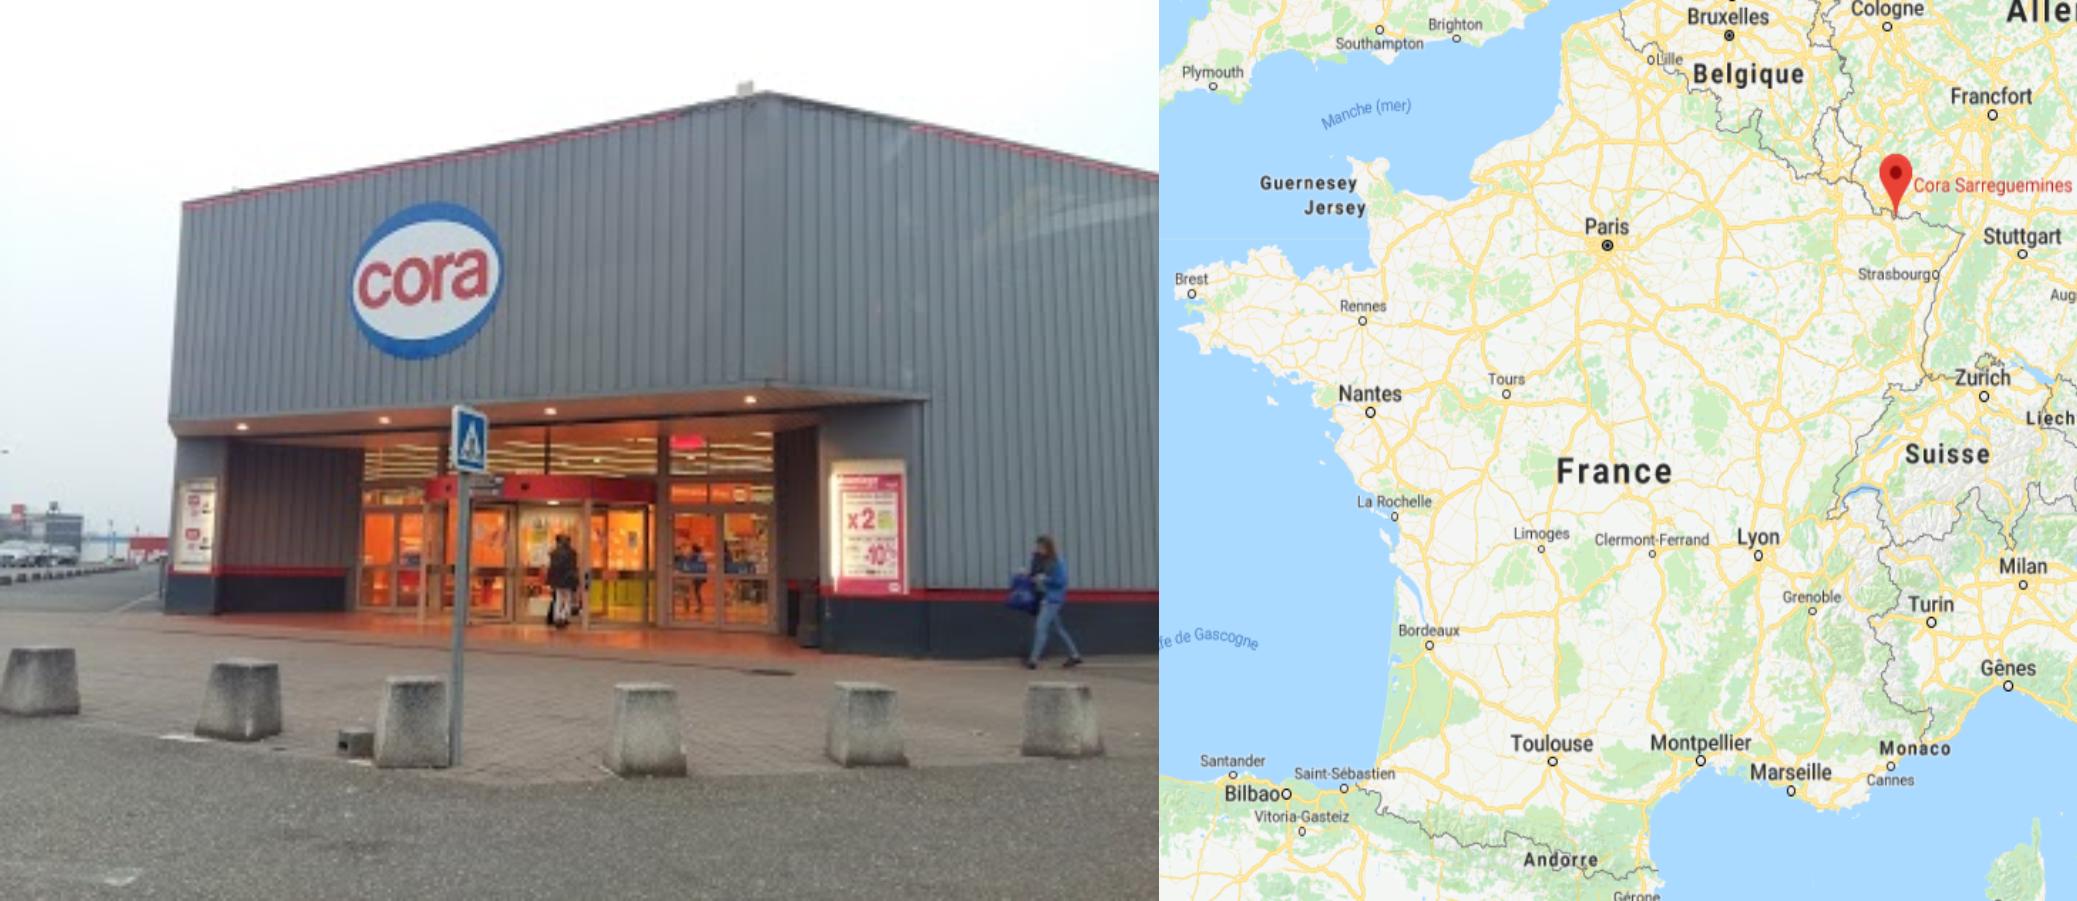 Centre commercial Cora Sarreguemines